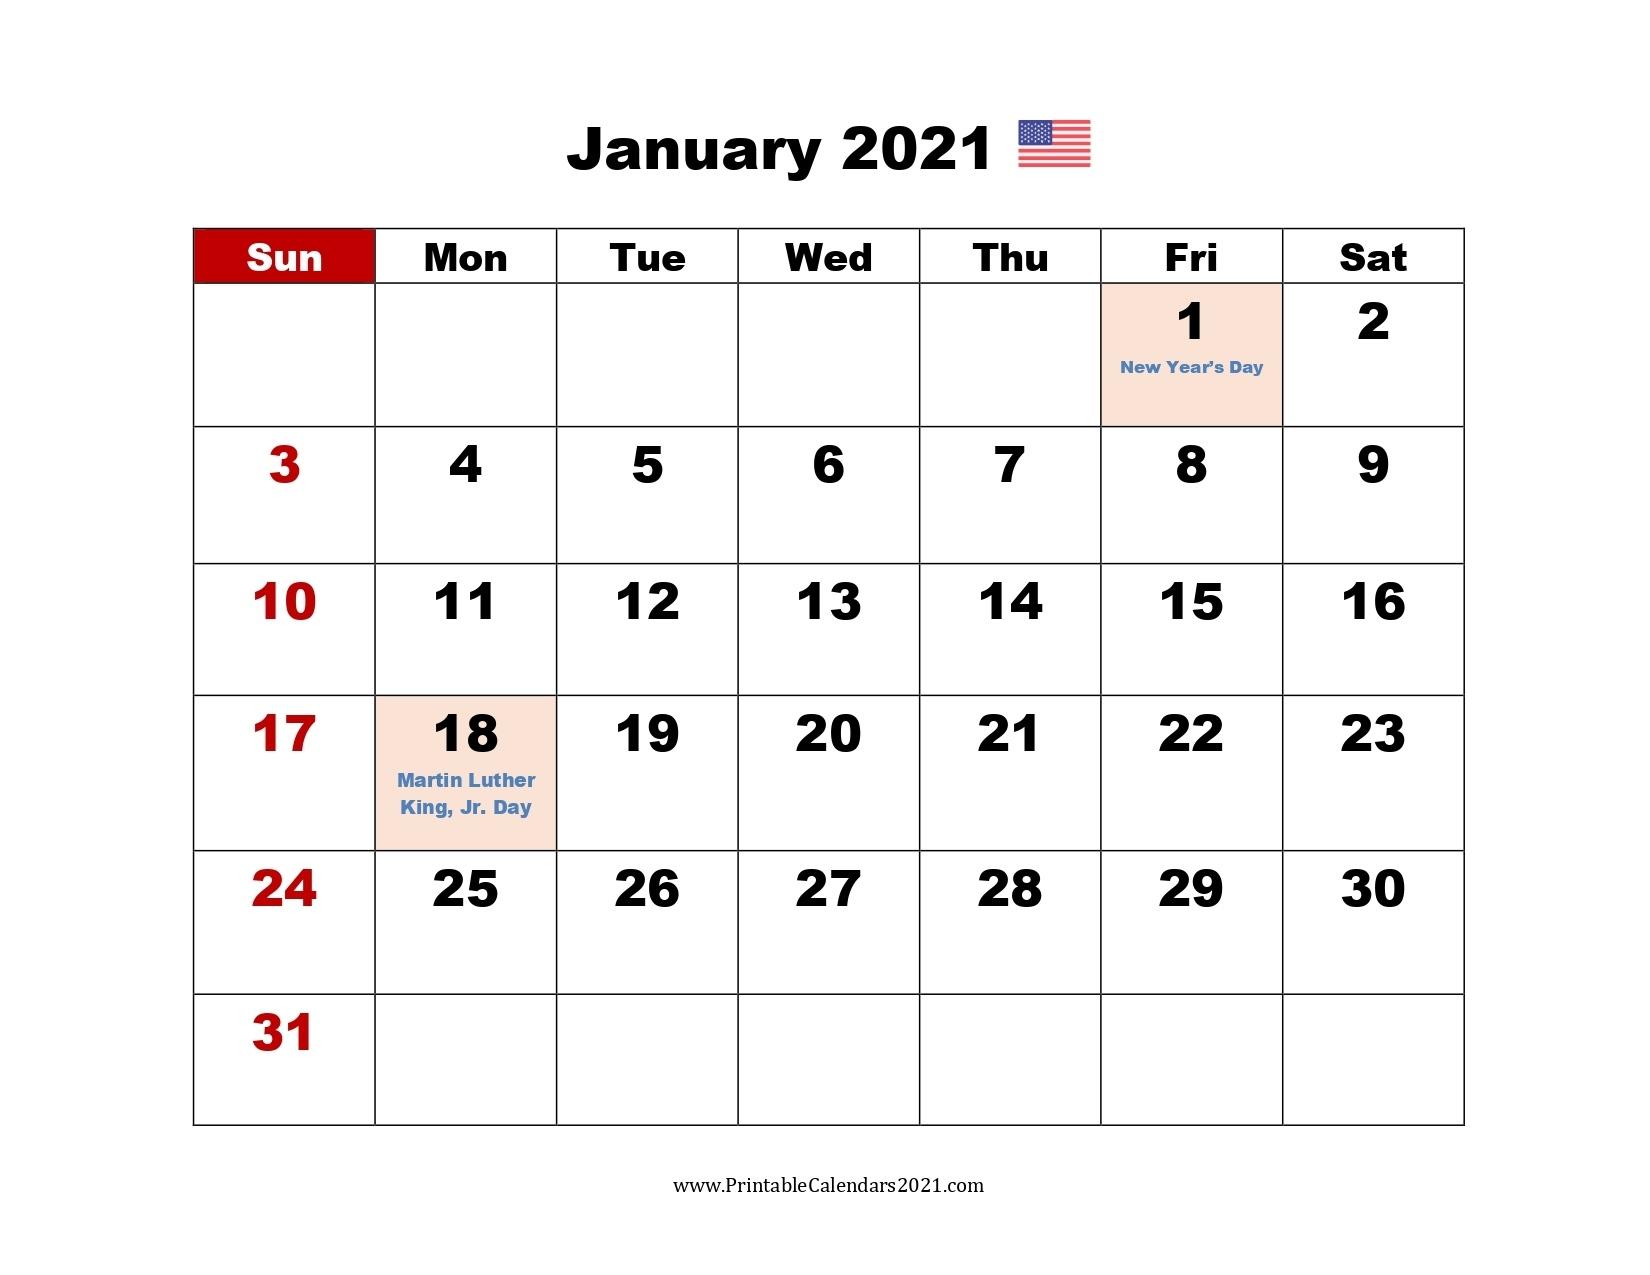 65+ January 2022 Calendar Printable, January 2022 Calendar Us Holidays Printable January Through December 2021 Calendar